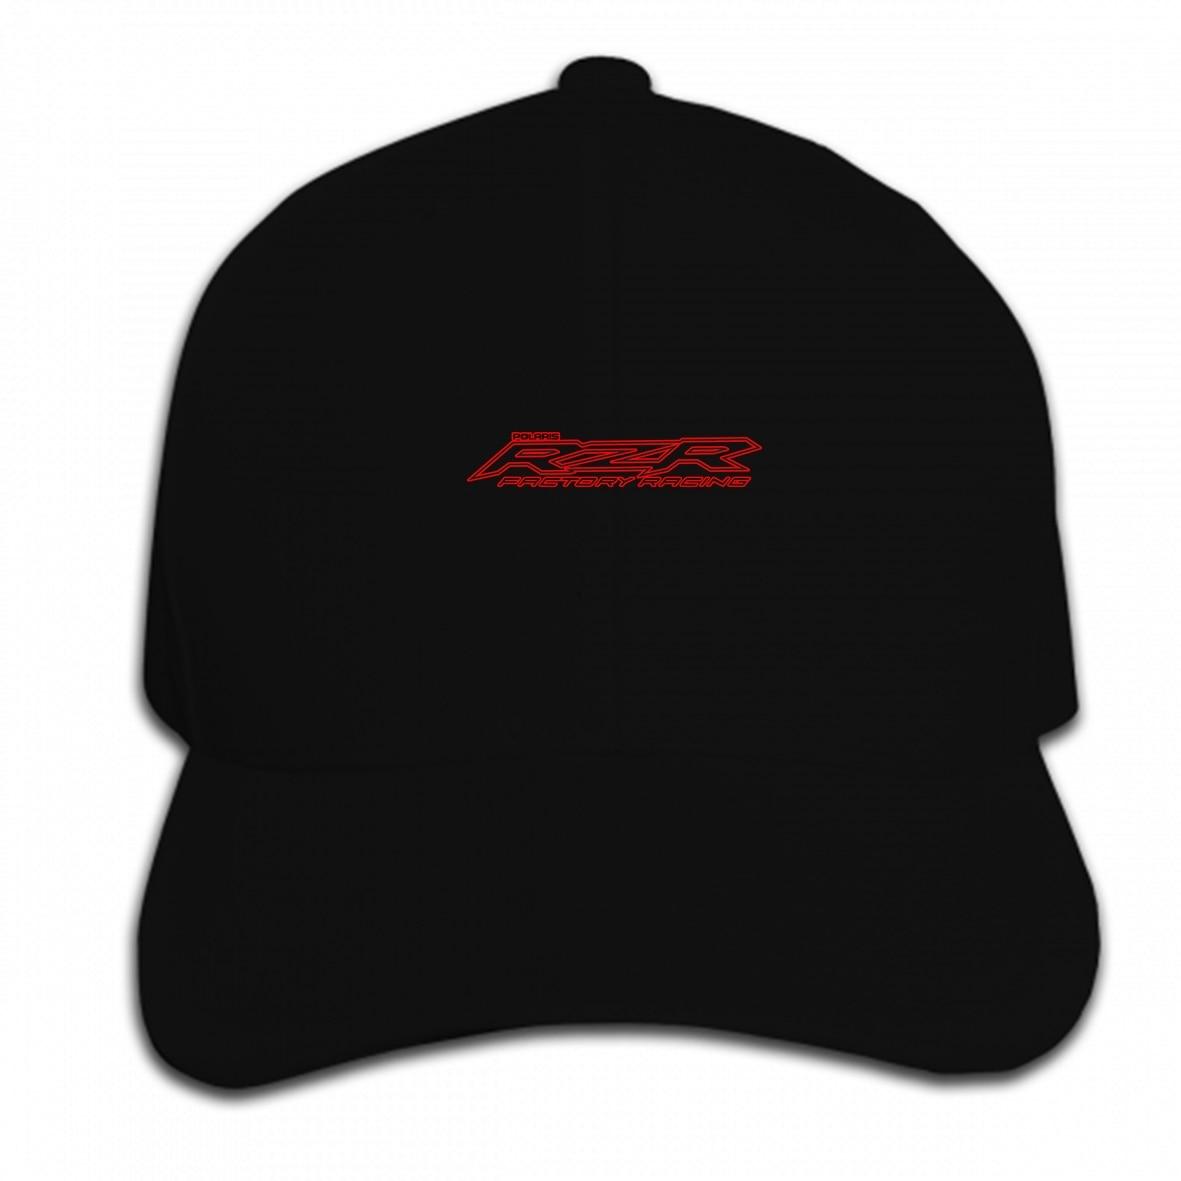 Imprimir personalizado gorra de béisbol Polaris RZR RacingMens negro sombrero pico Cap